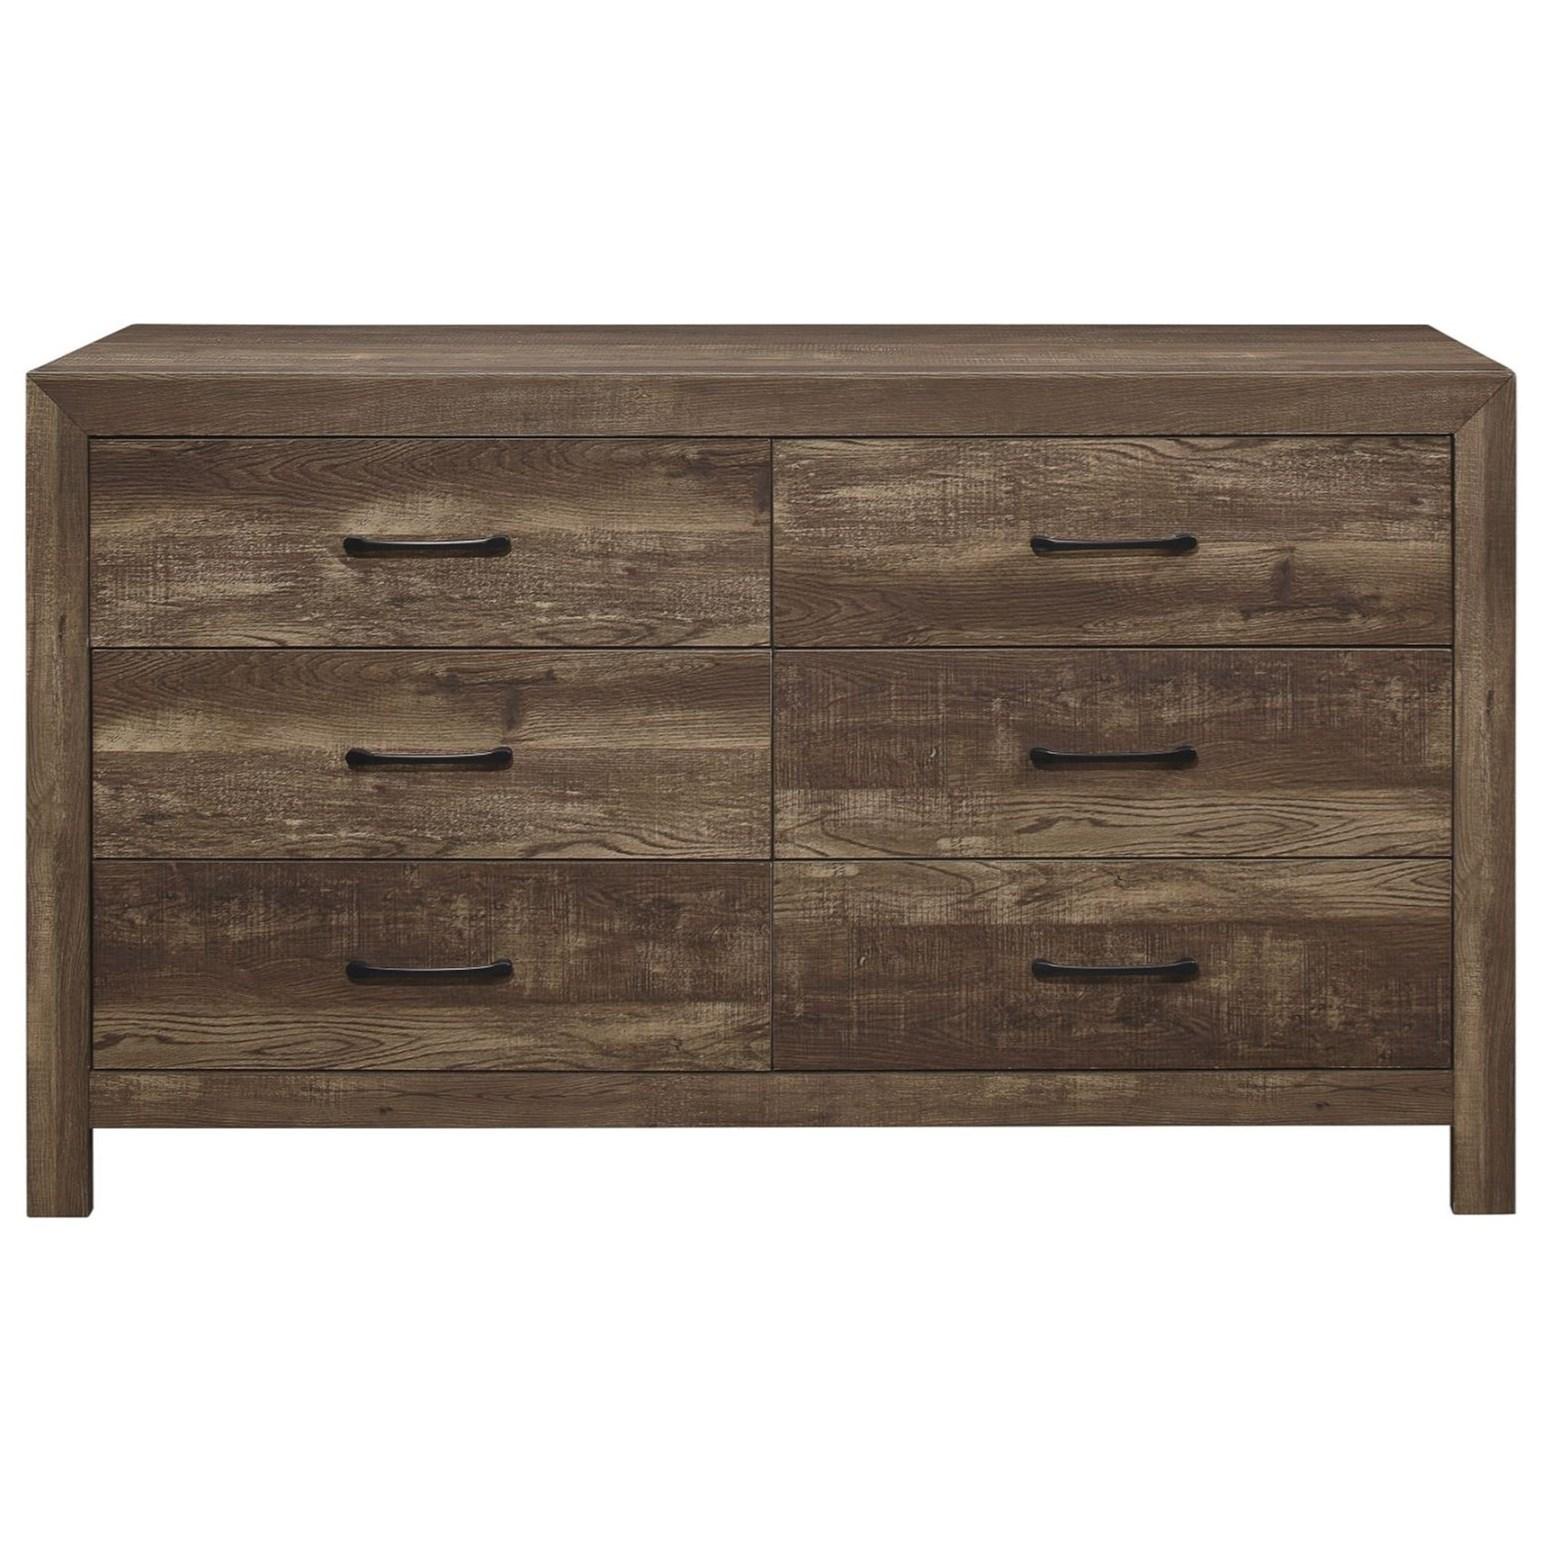 Corbin Dresser by Homelegance at Rife's Home Furniture